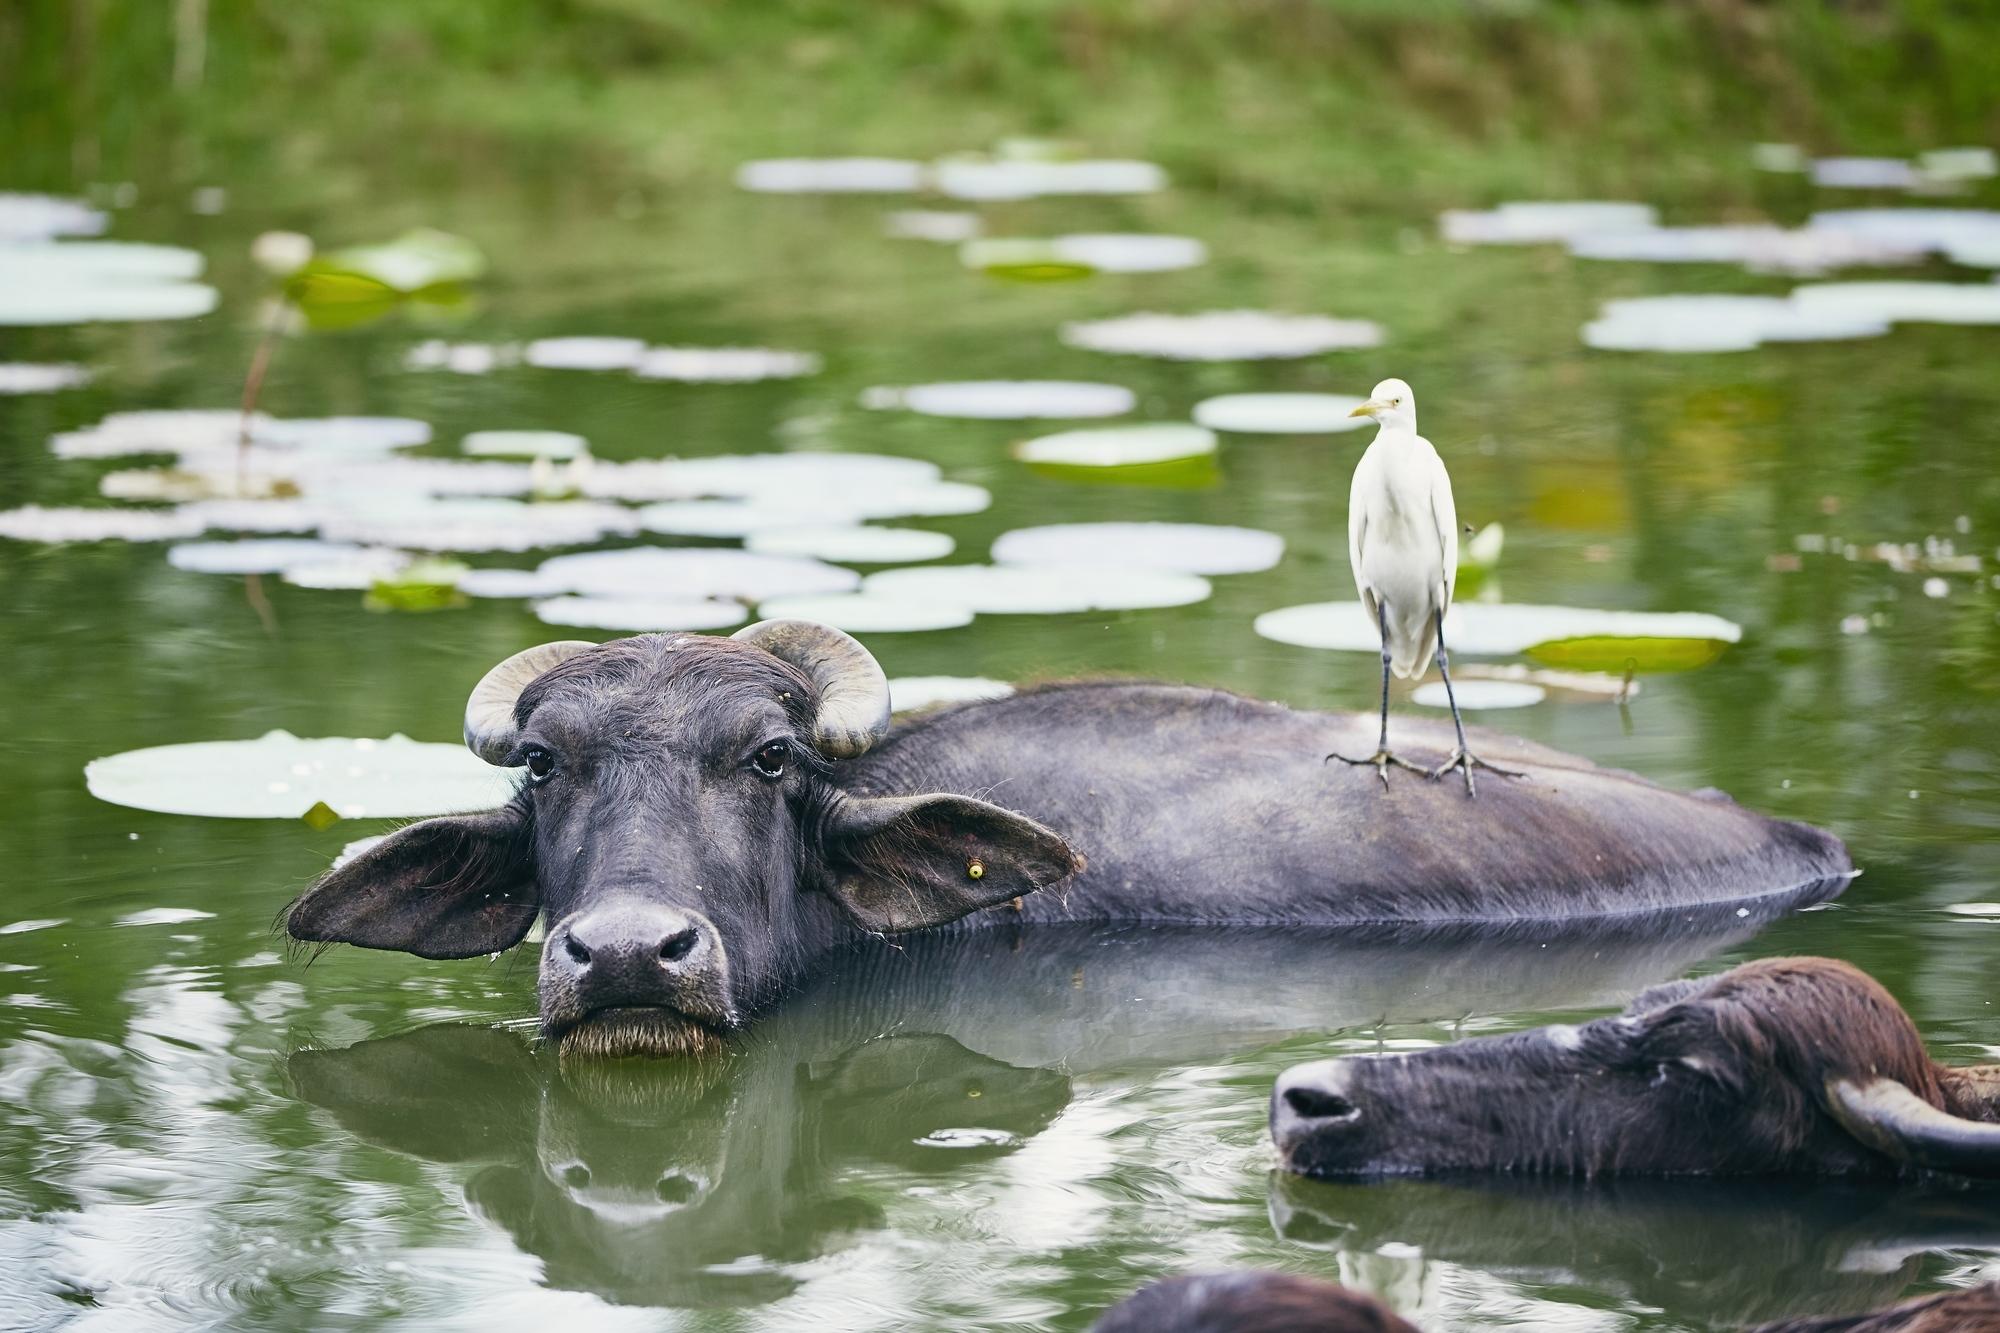 Symbiotic relationship between water buffalo and bird in lake. Nature in Sri Lanka.